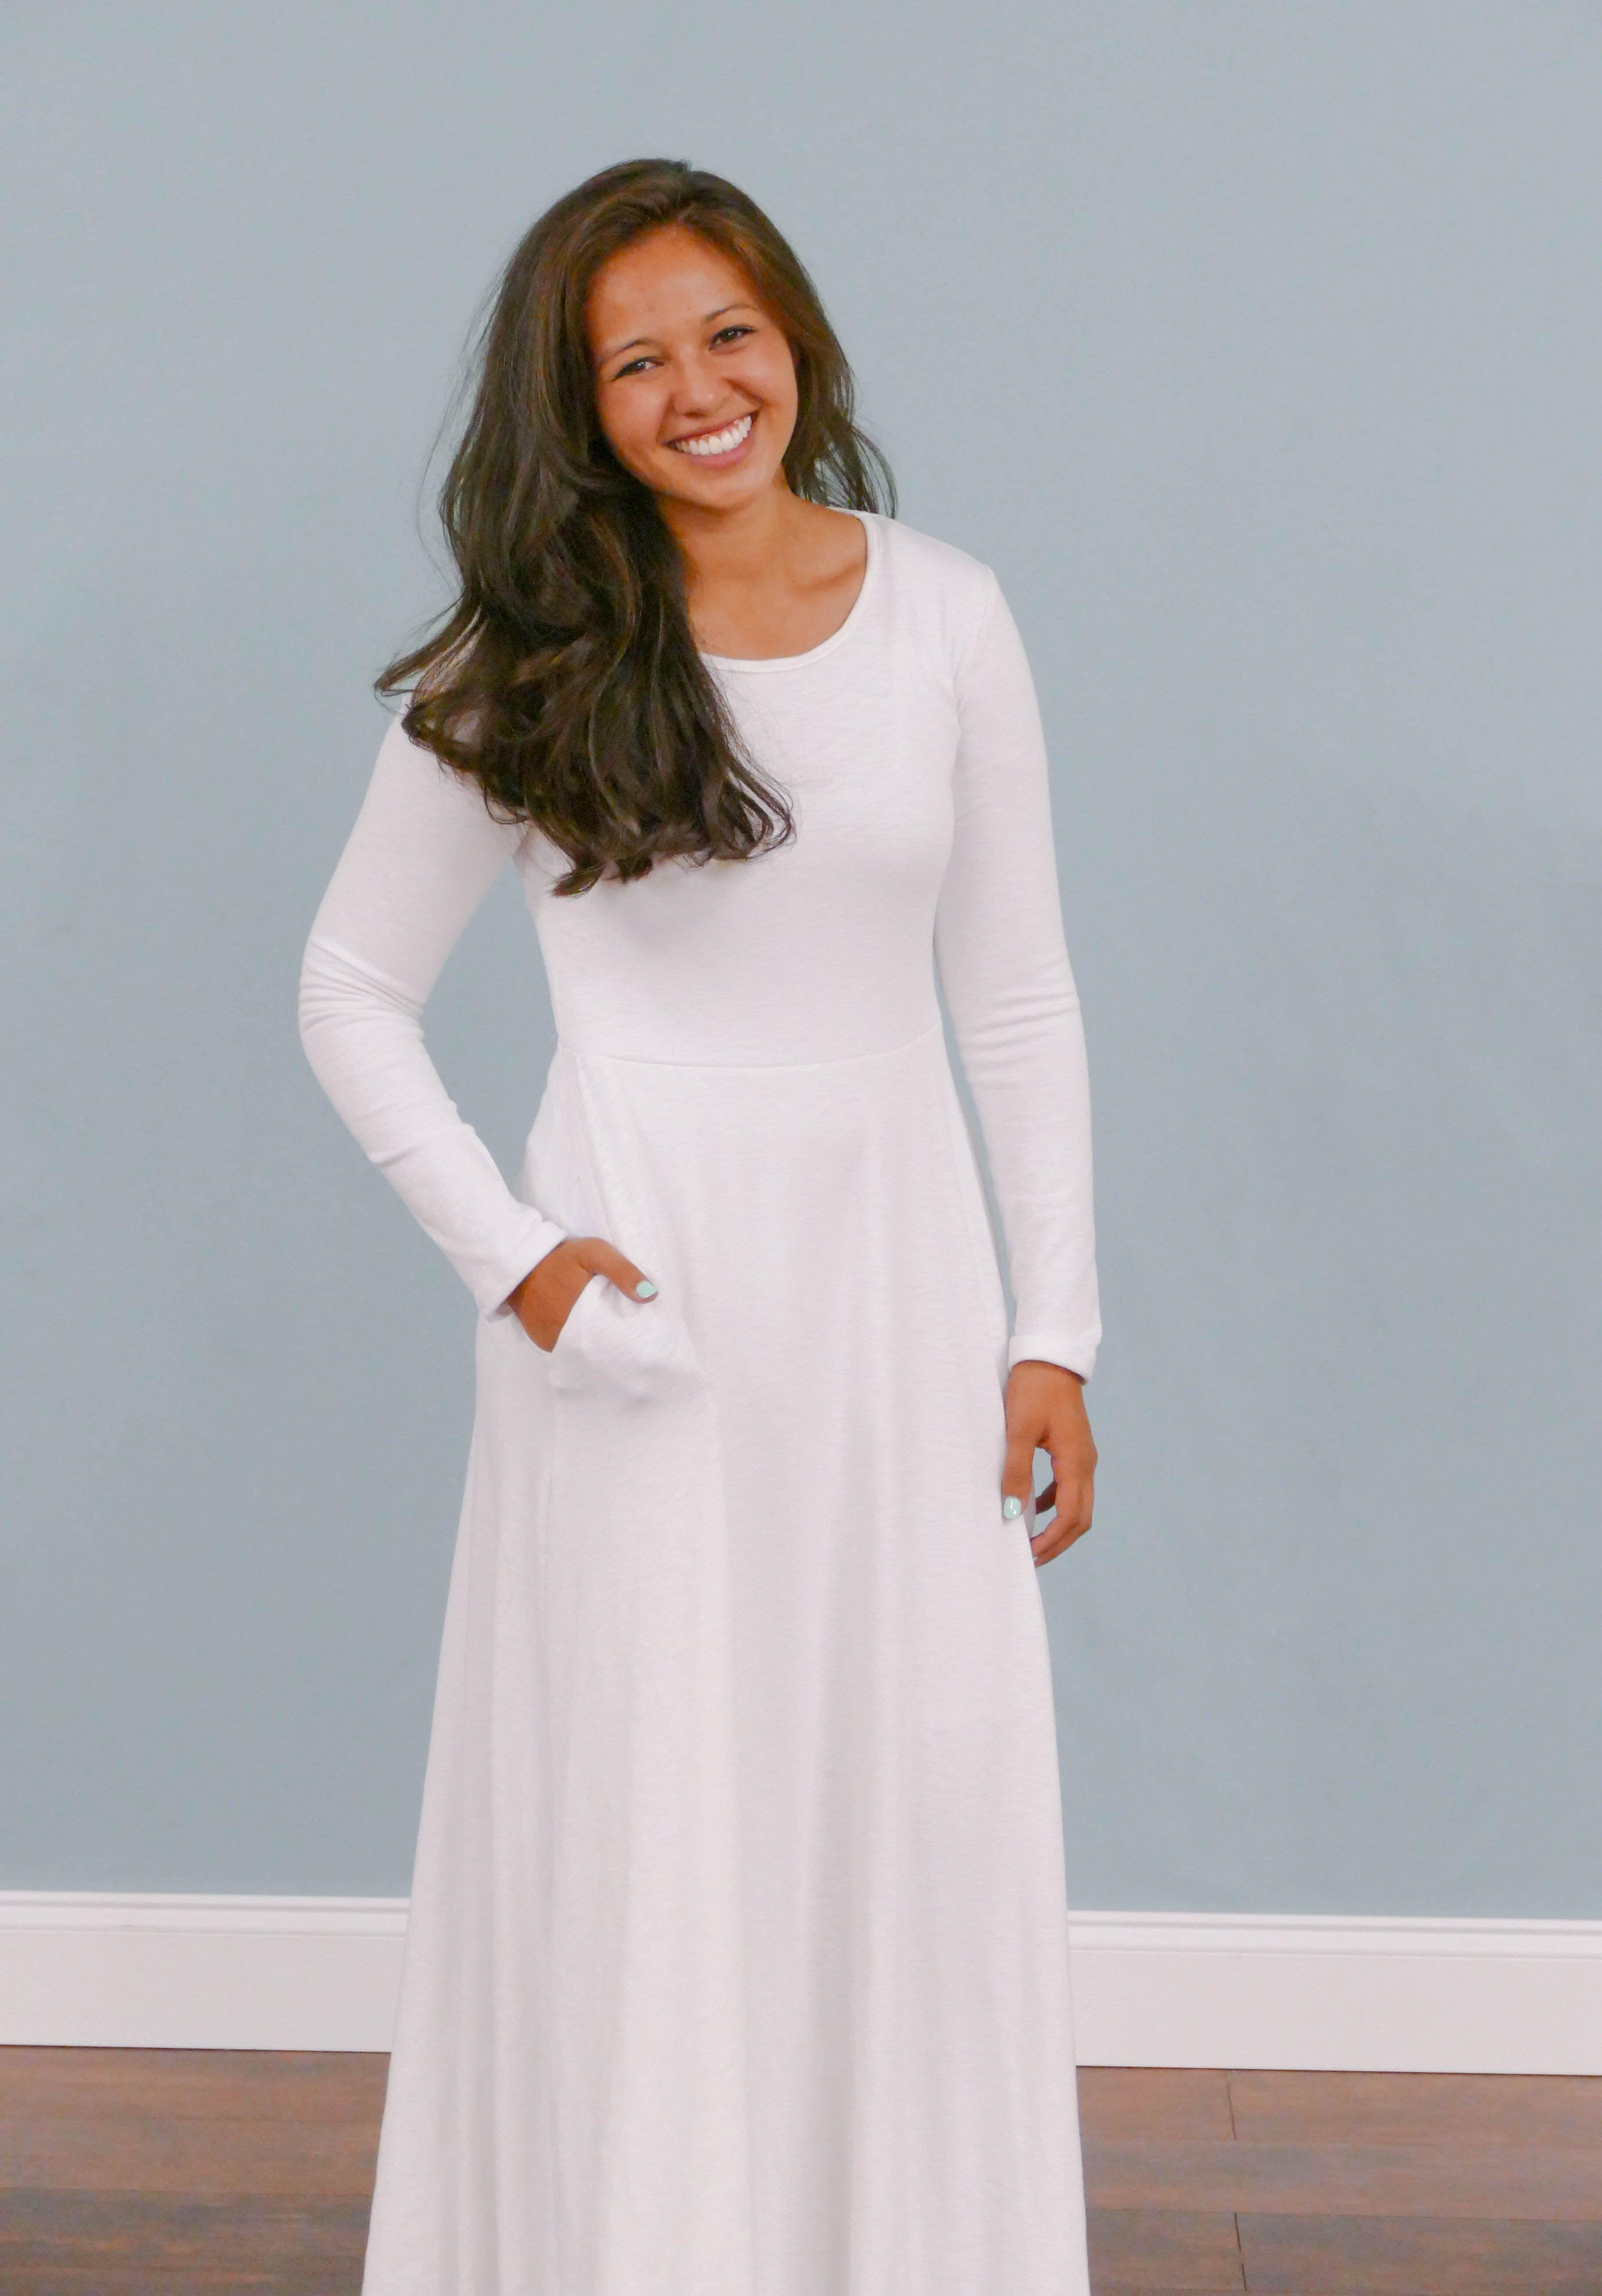 Eileen Temple Dress Temple Dress Dresses Lds Temple Dress [ 5229 x 3648 Pixel ]